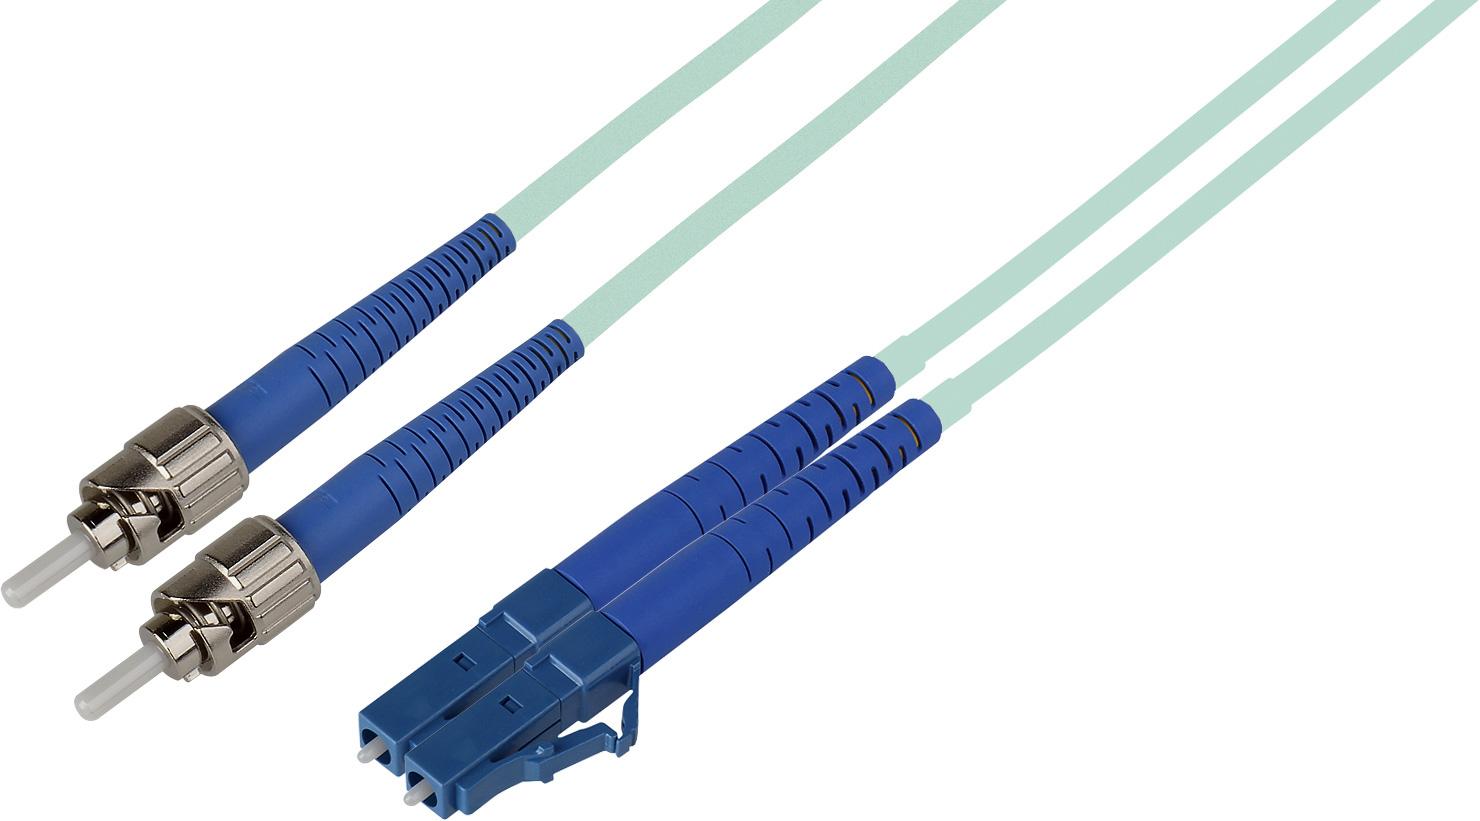 10 Meter 50 125 Fiber Optic Patch Cable Multimode Duplex